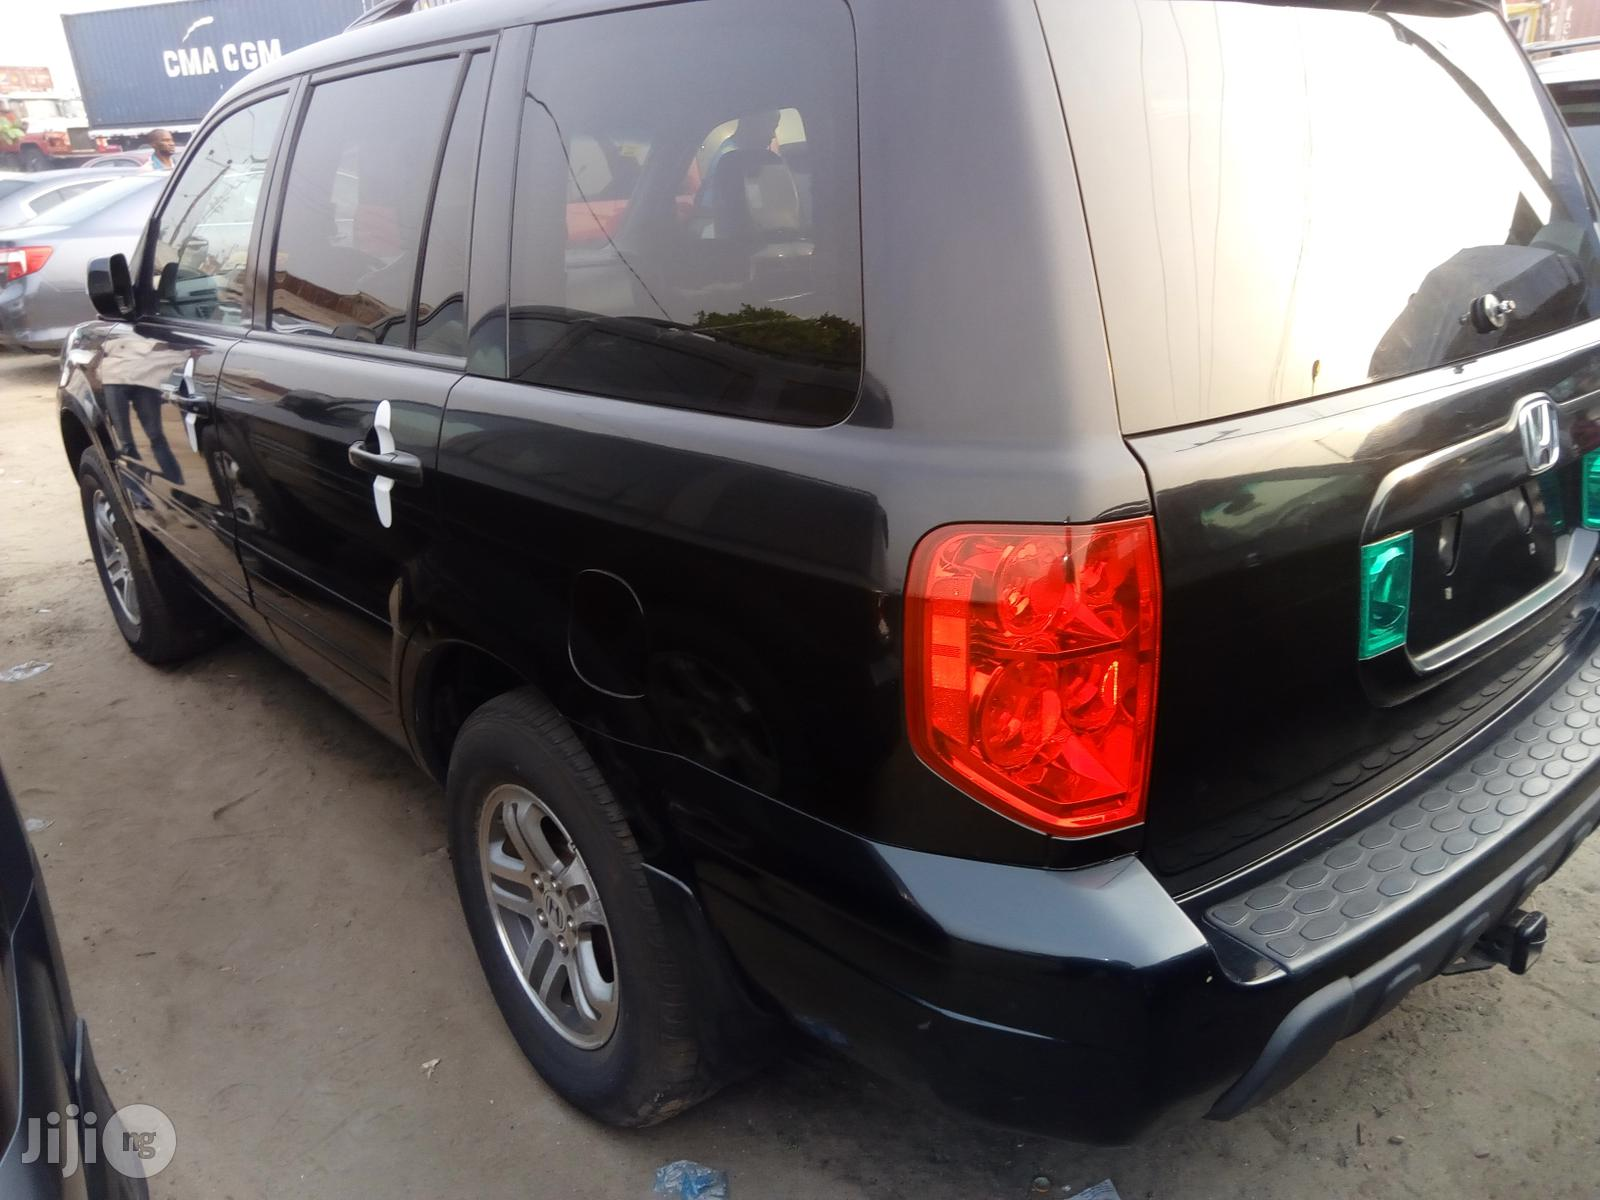 Honda Pilot 2005 LX 4x4 (3.5L 6cyl 5A) Black | Cars for sale in Amuwo-Odofin, Lagos State, Nigeria